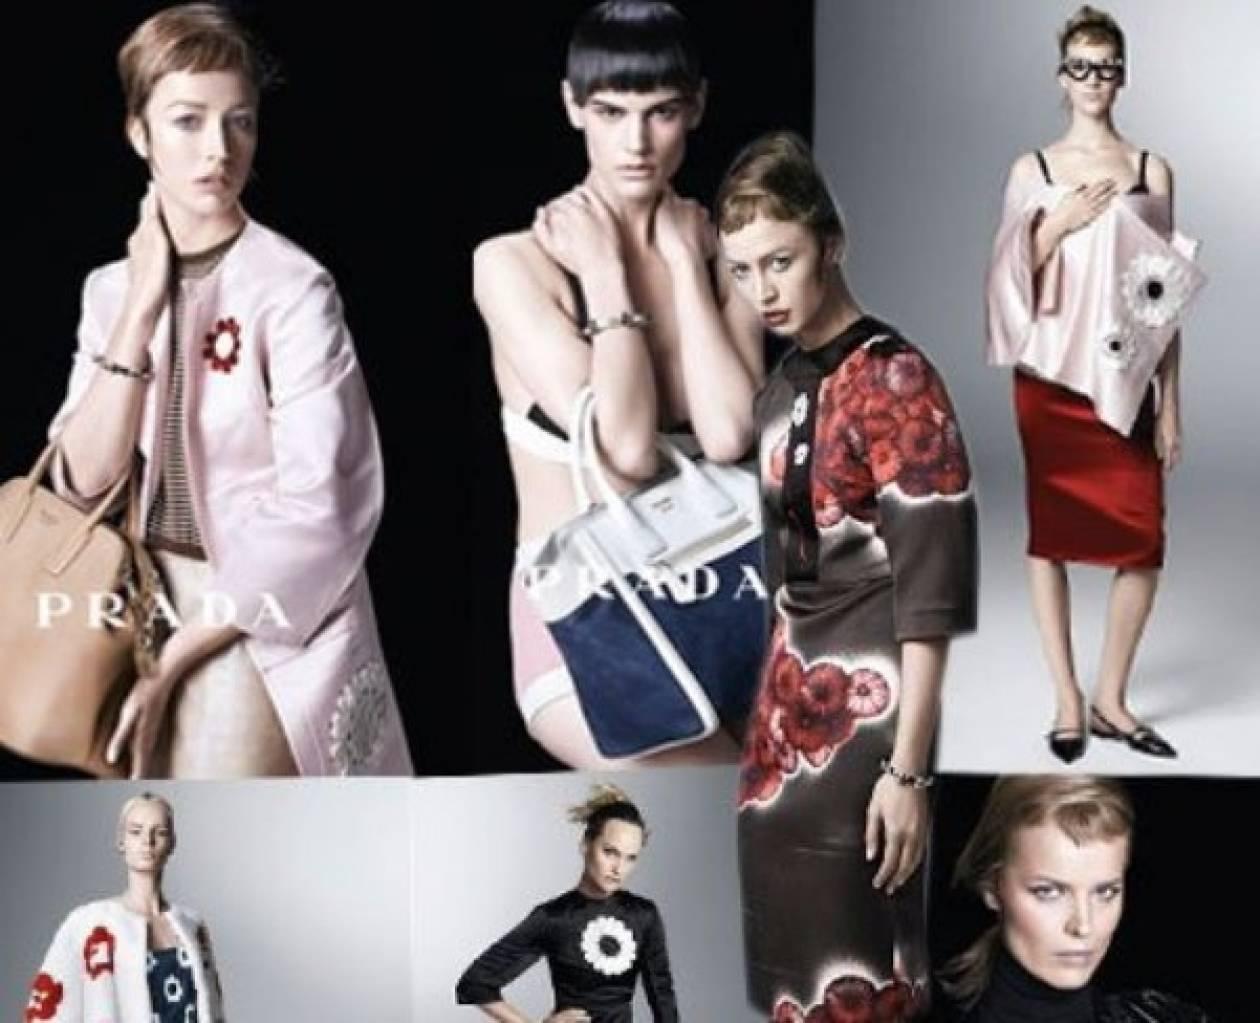 Prada: έντεκα καλλονές πρωταγωνιστούν στη νέα καμπάνια